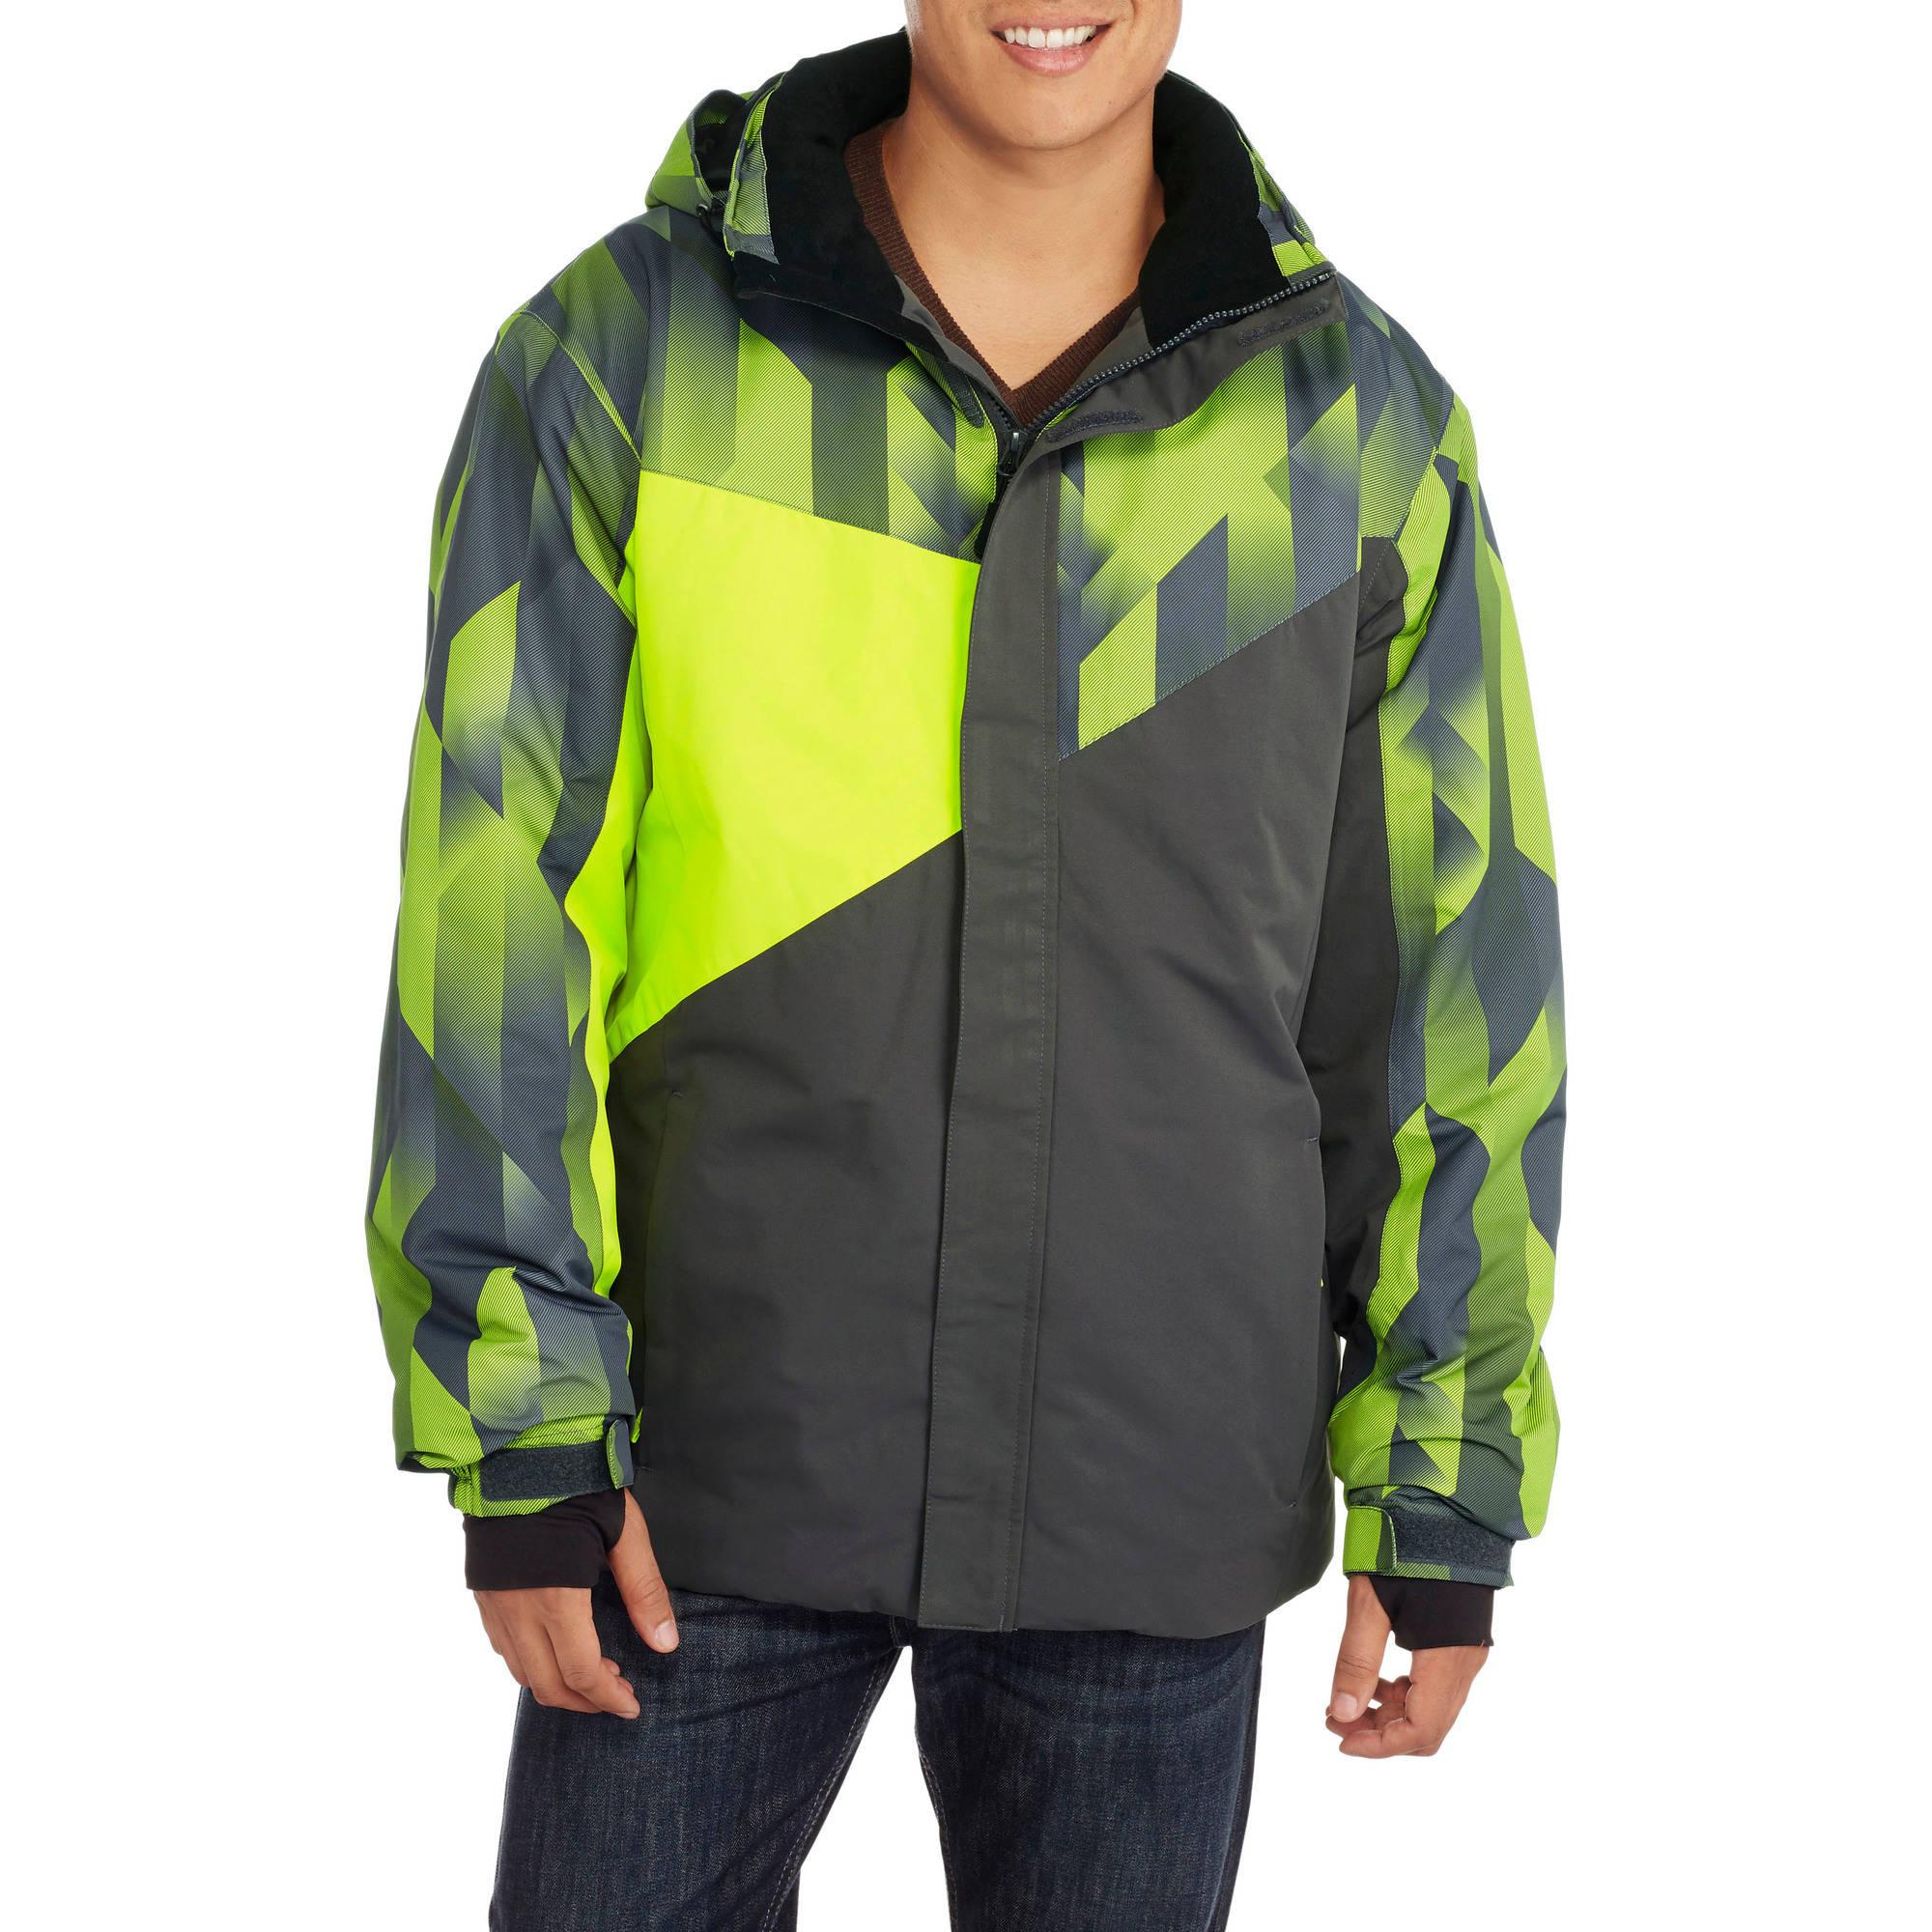 Big Men's Vision Insulated Jacket